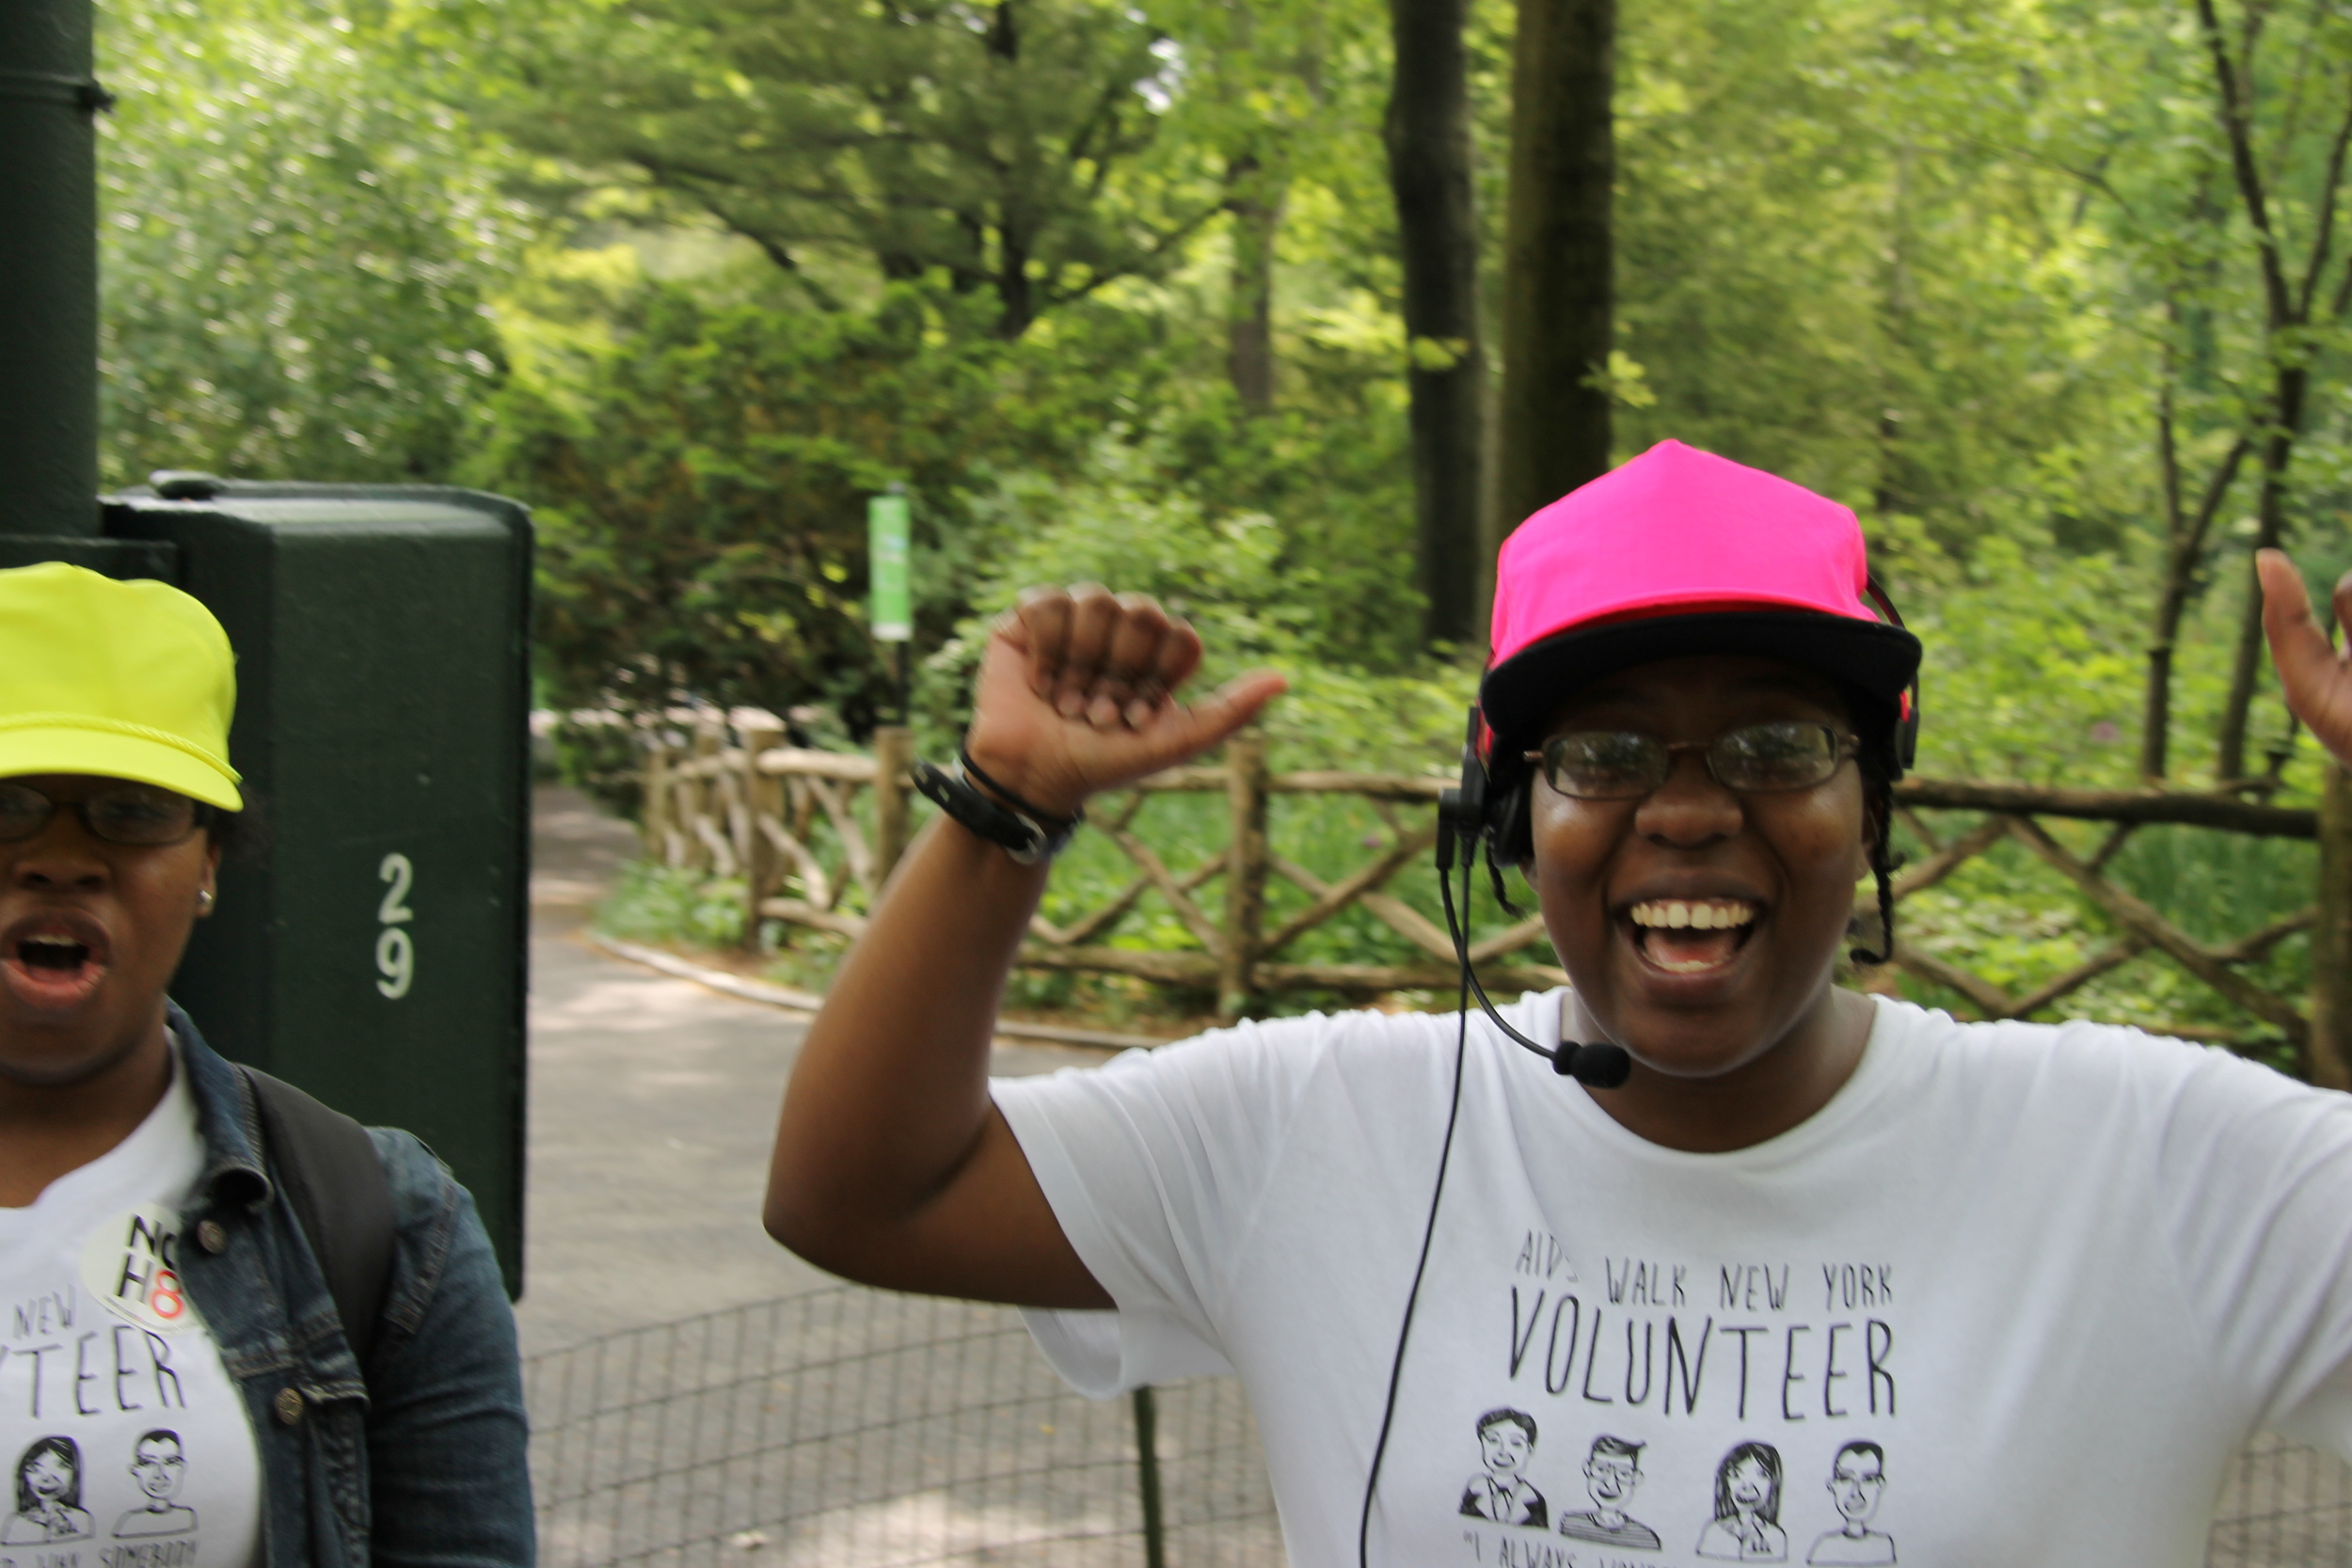 AIDS Walk Volunteer